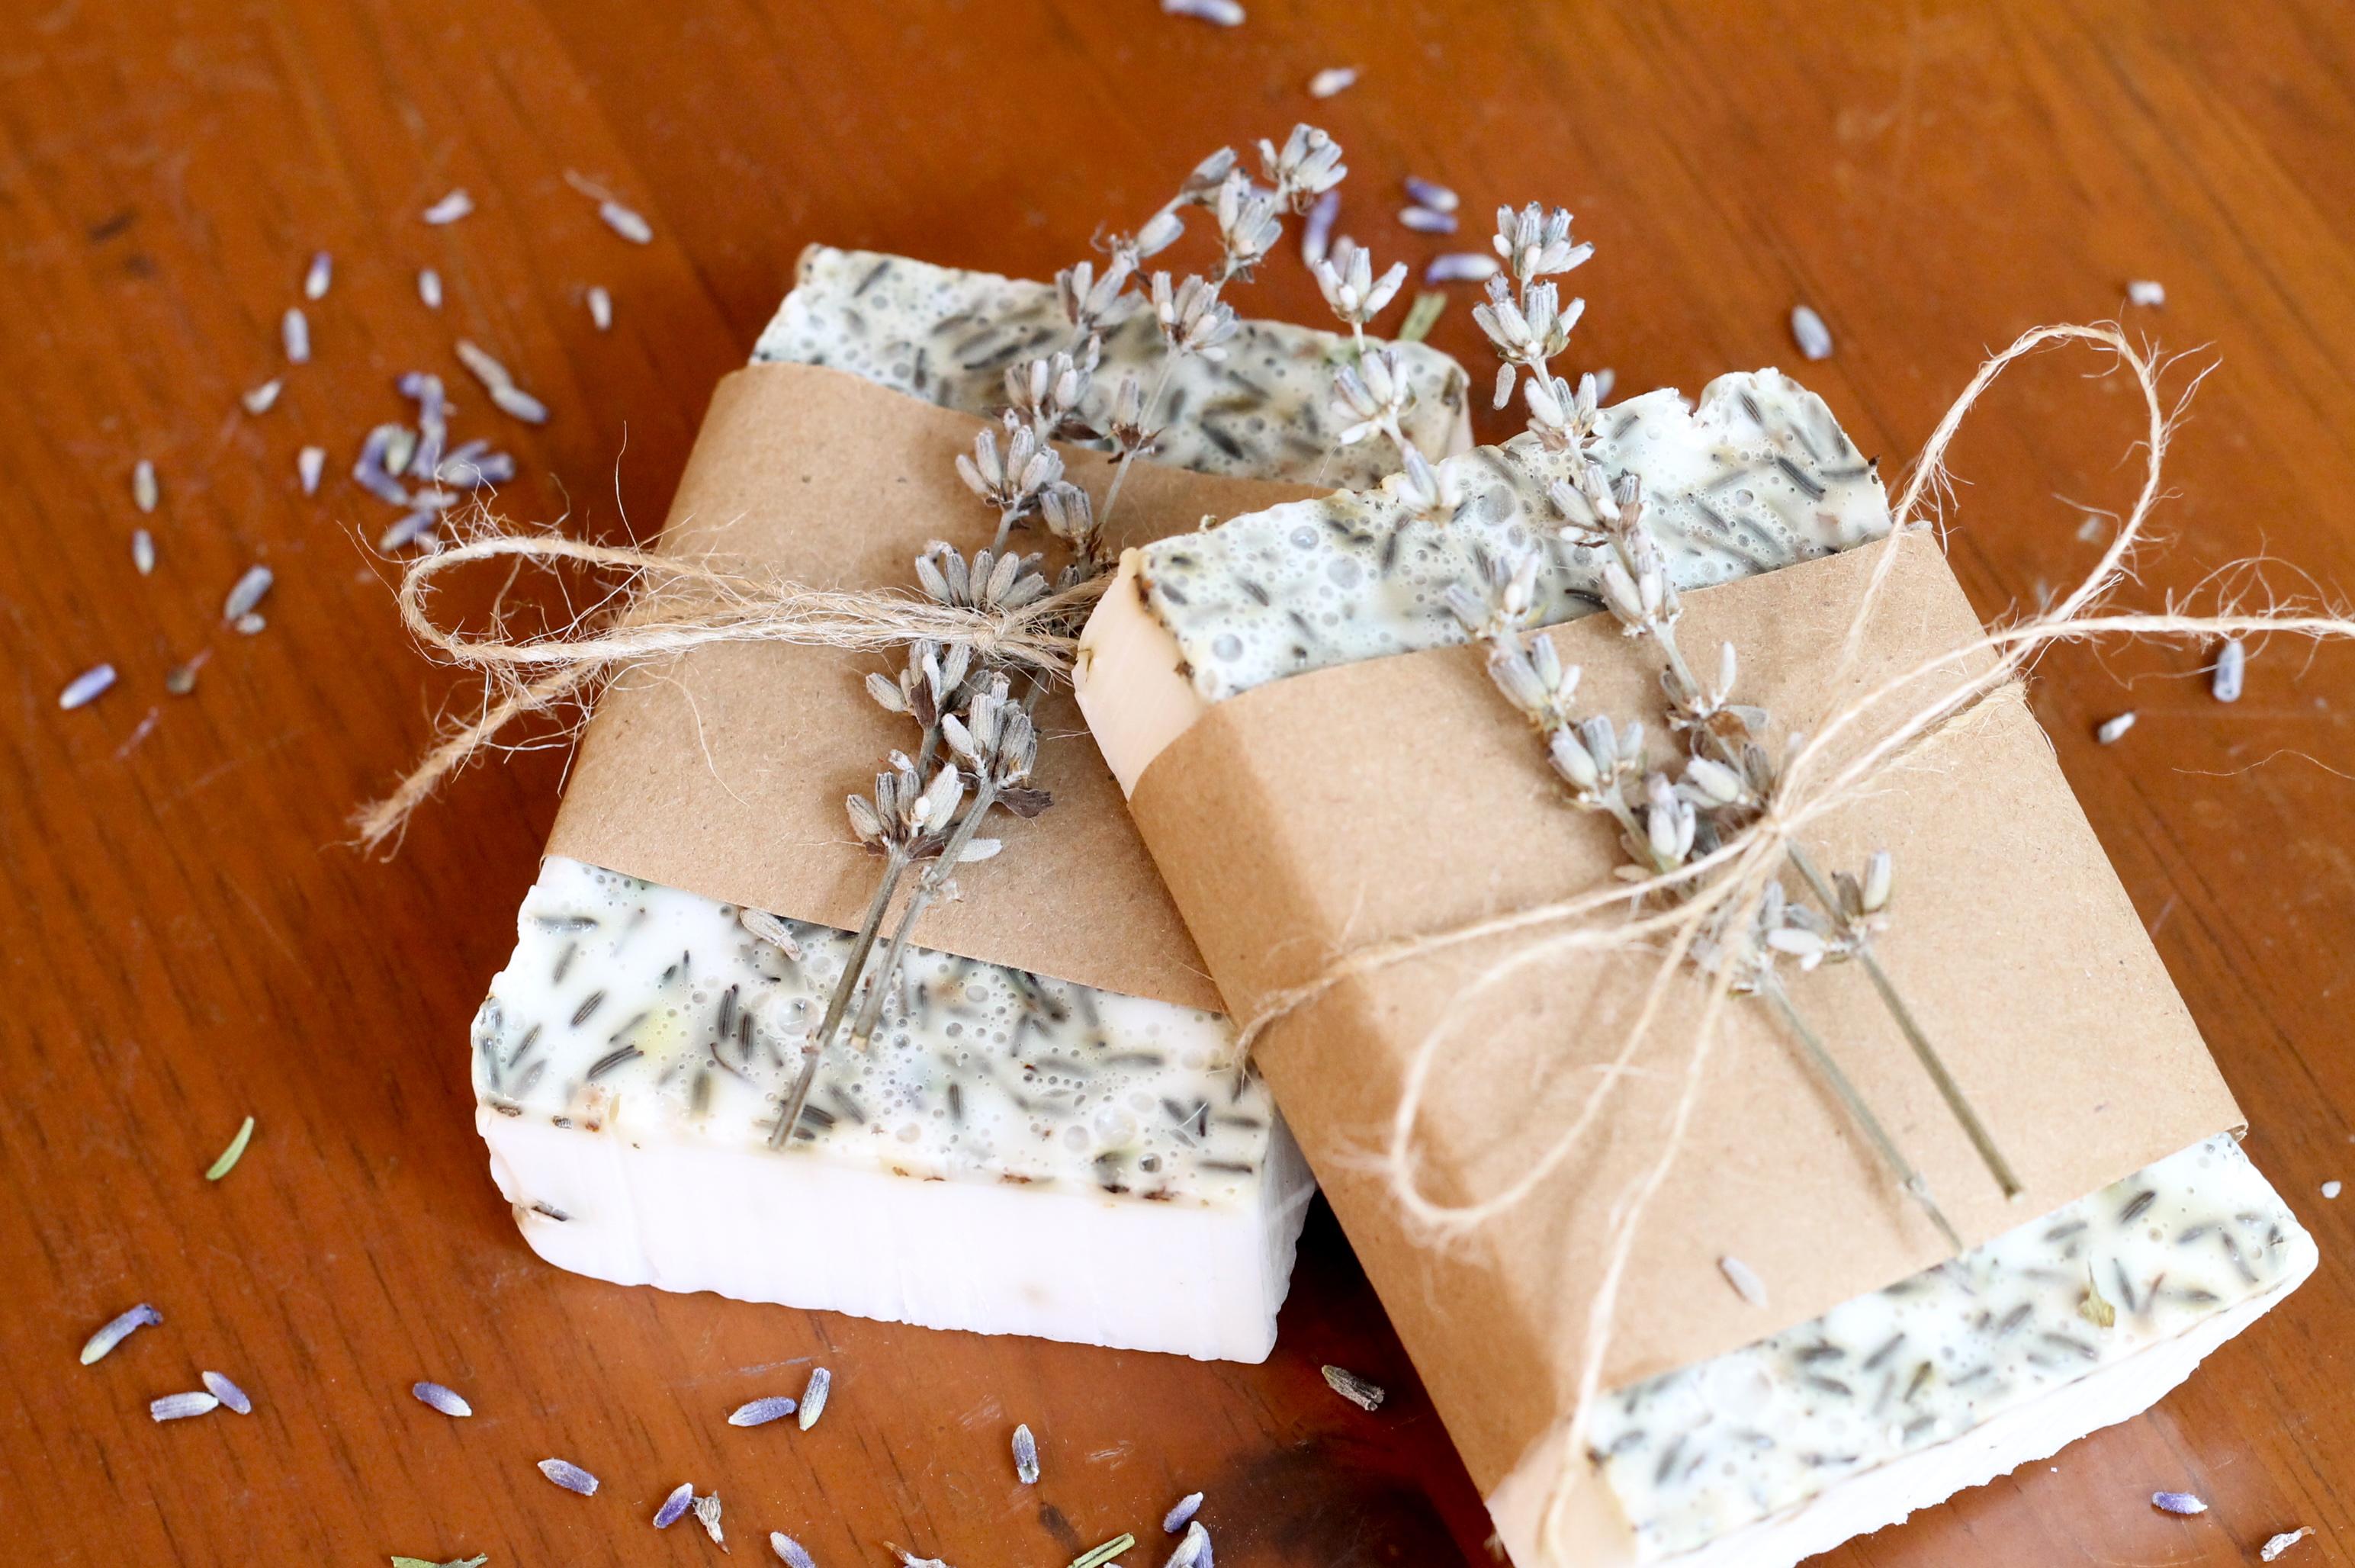 IMG 0834 - DIY Lavender Soap Recipe